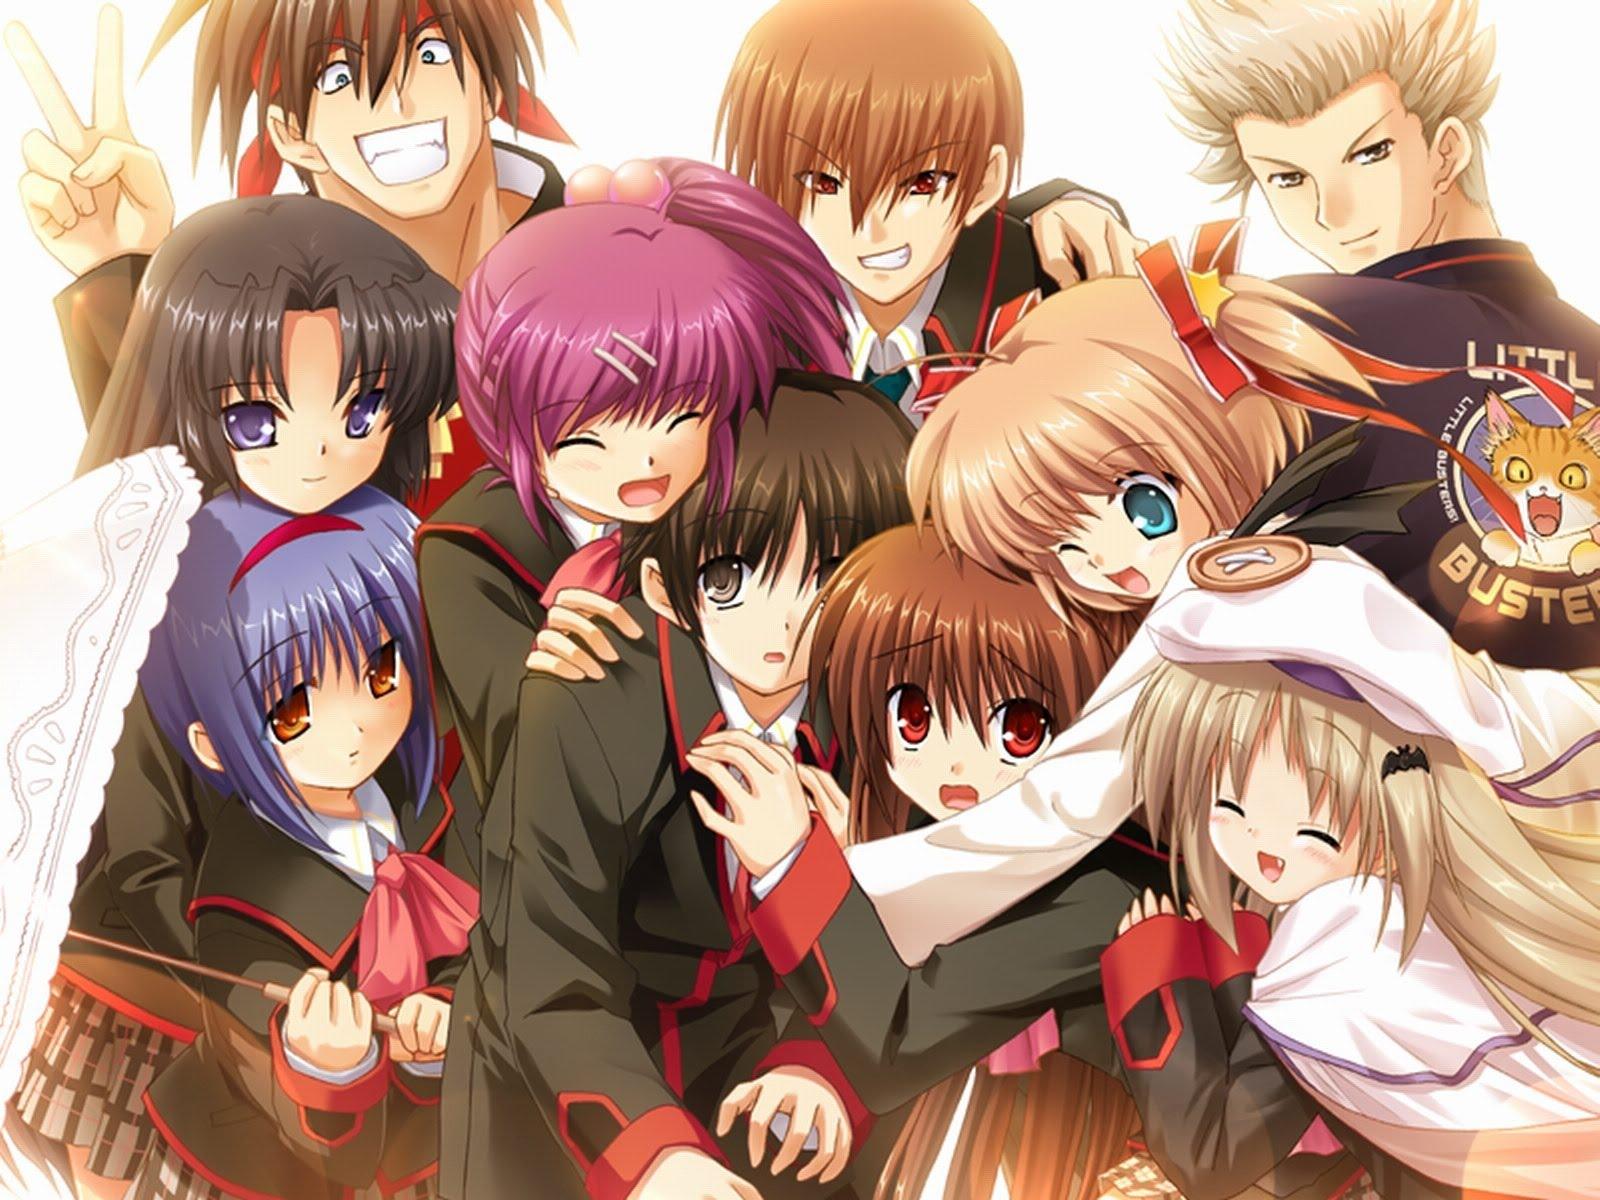 Riview Anime Seru Little Buster OST Beserta Reviewnya Sad Atau